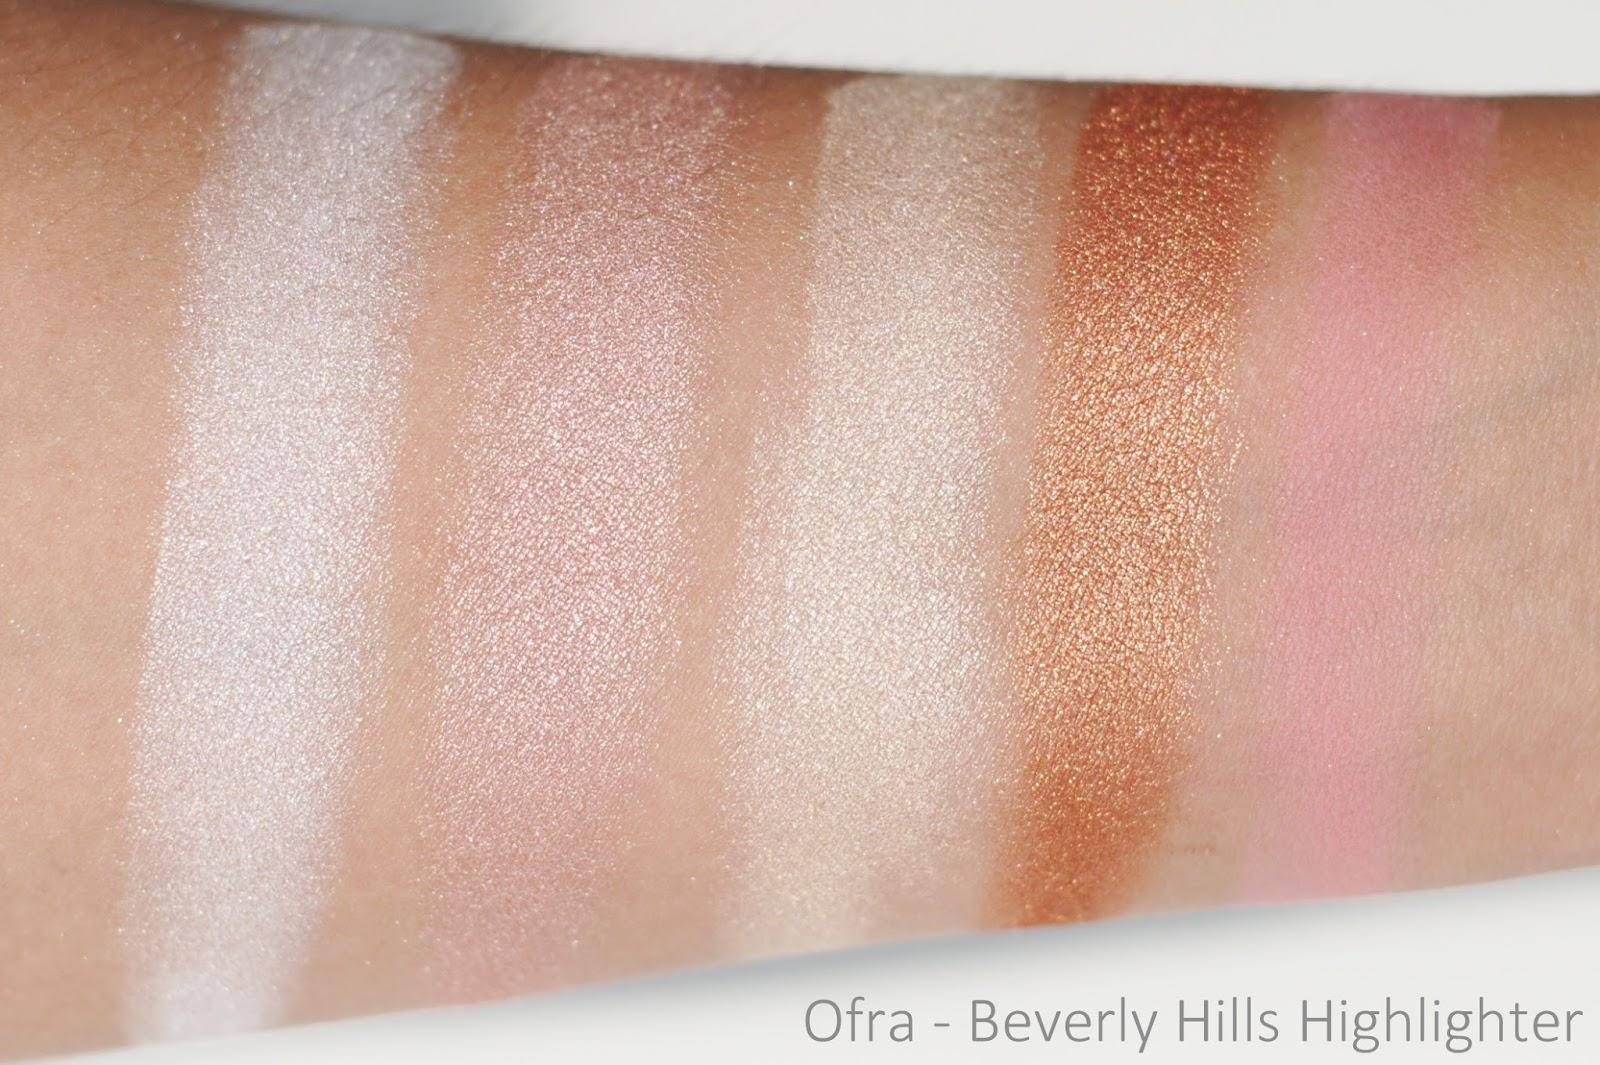 Beverly Hills Highlighter by ofra #11